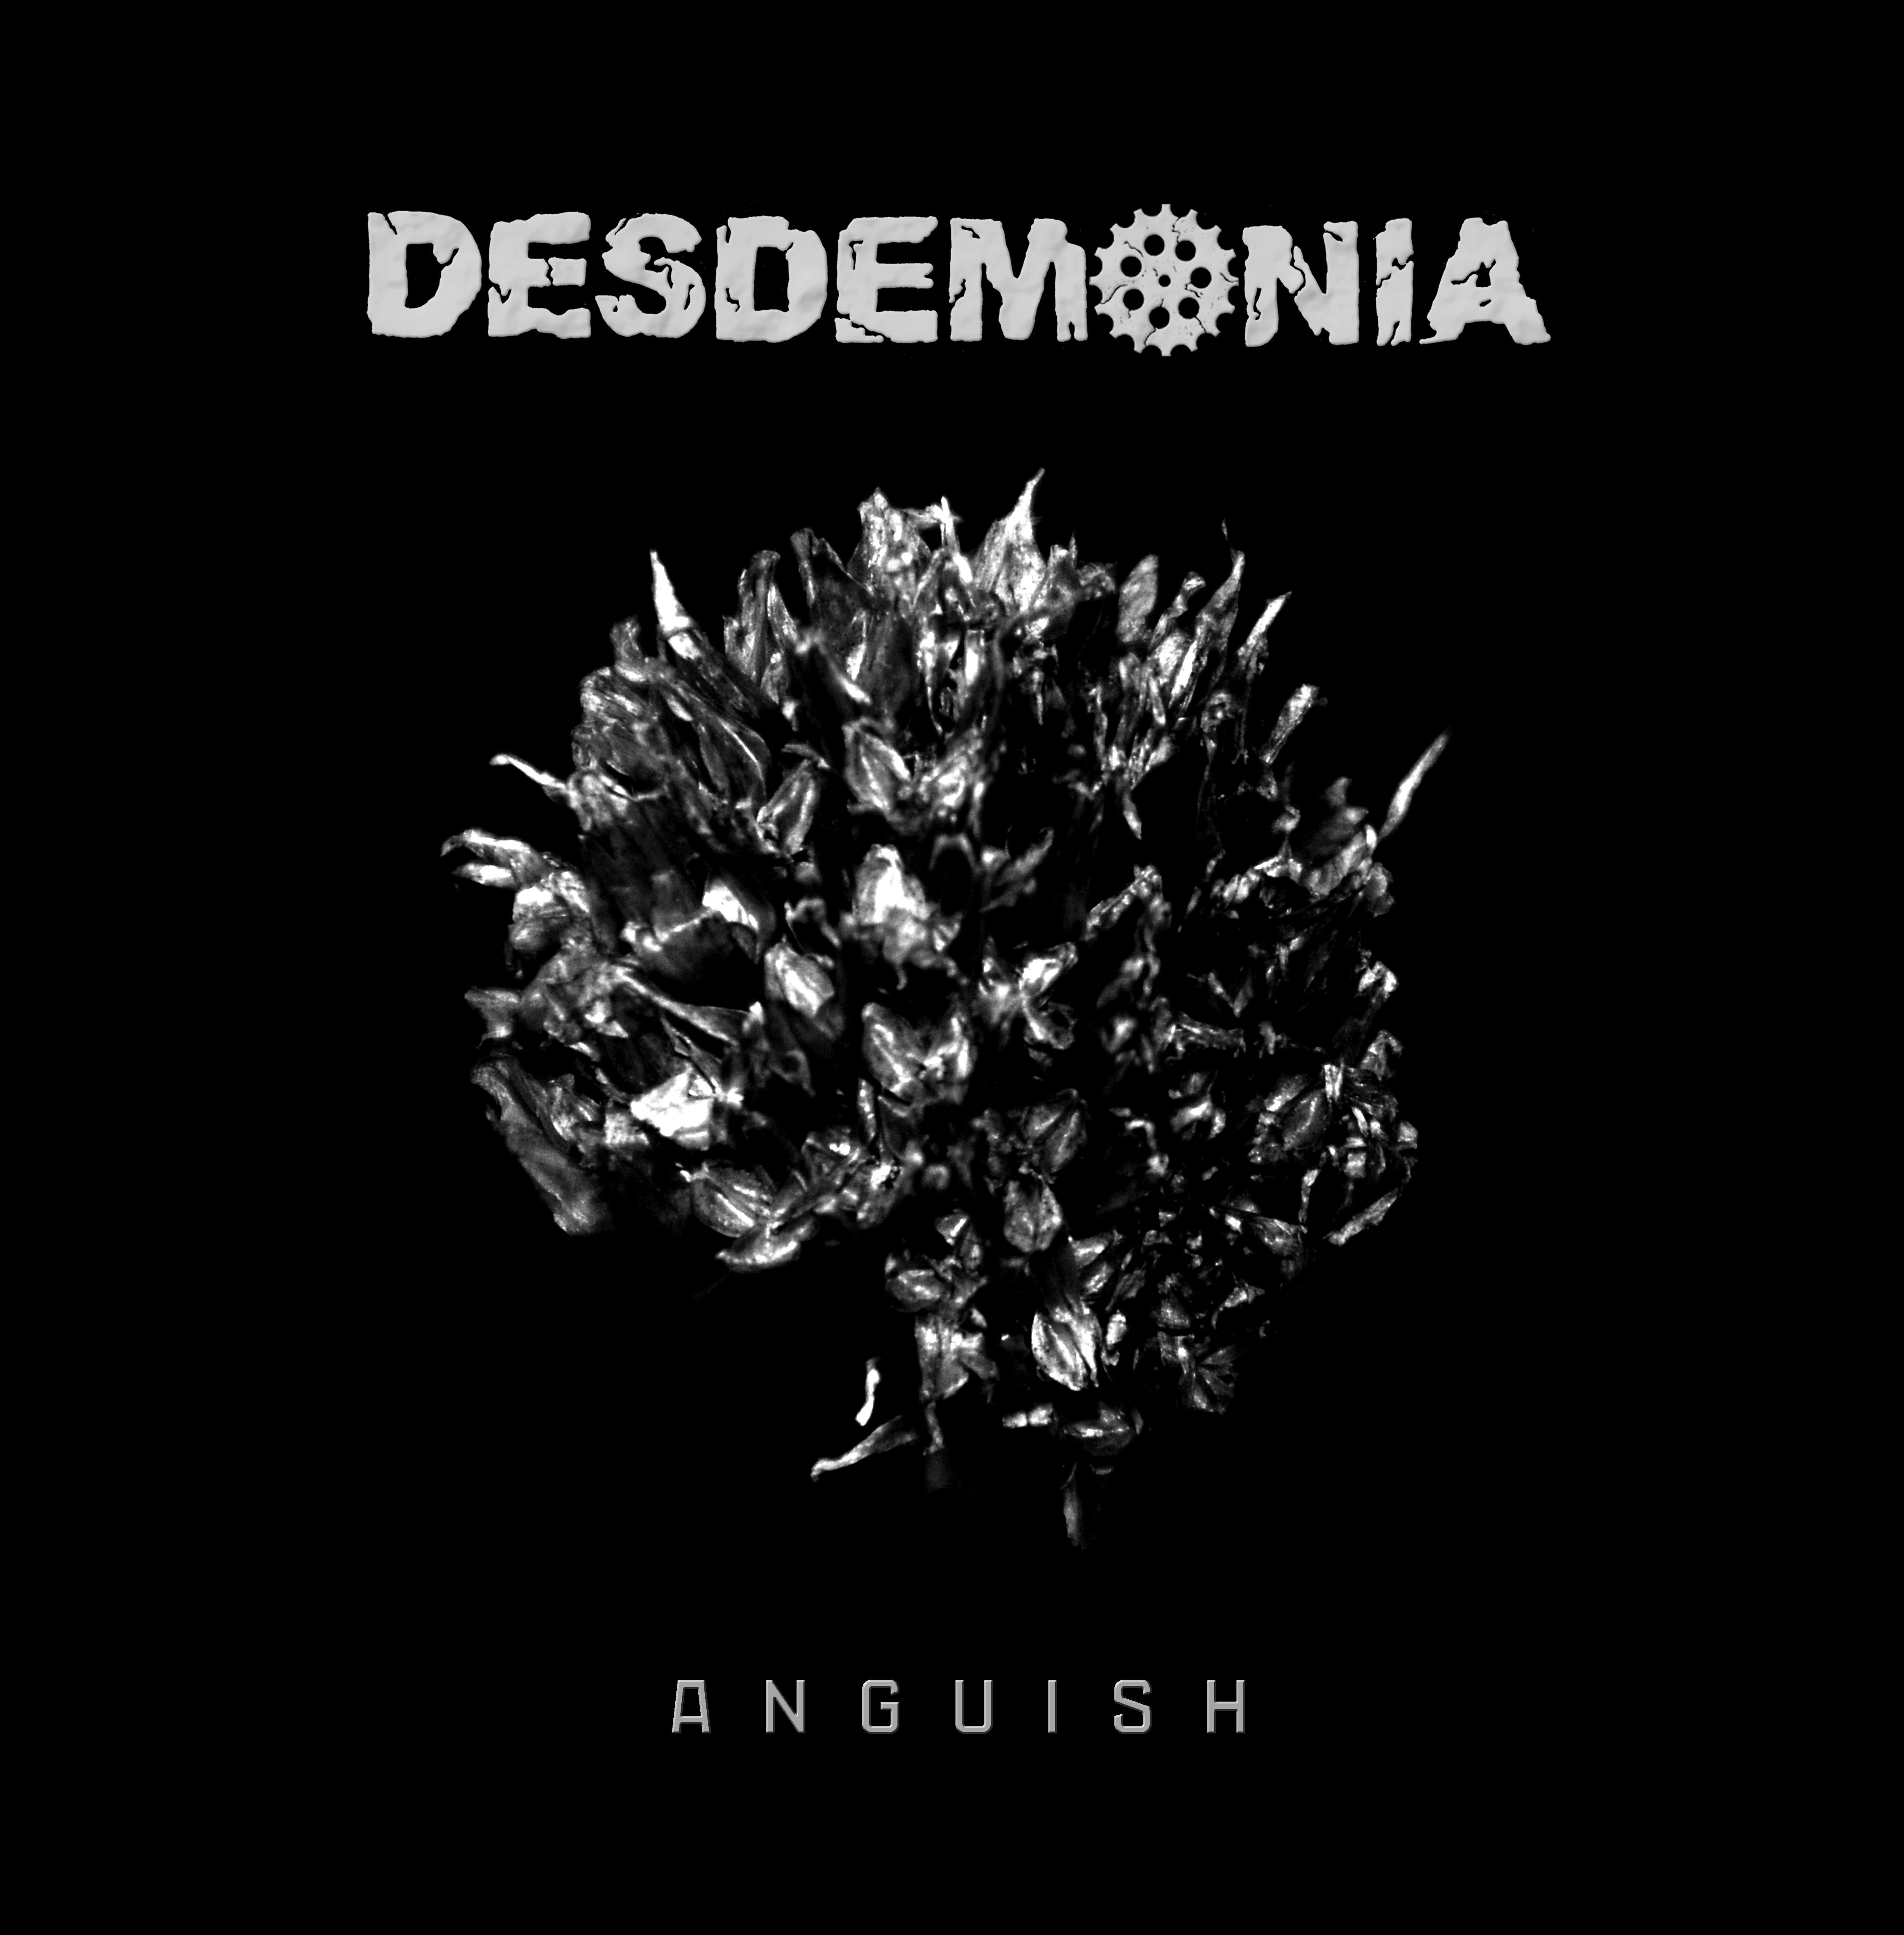 desdemonia-anguish-ein-cd-review